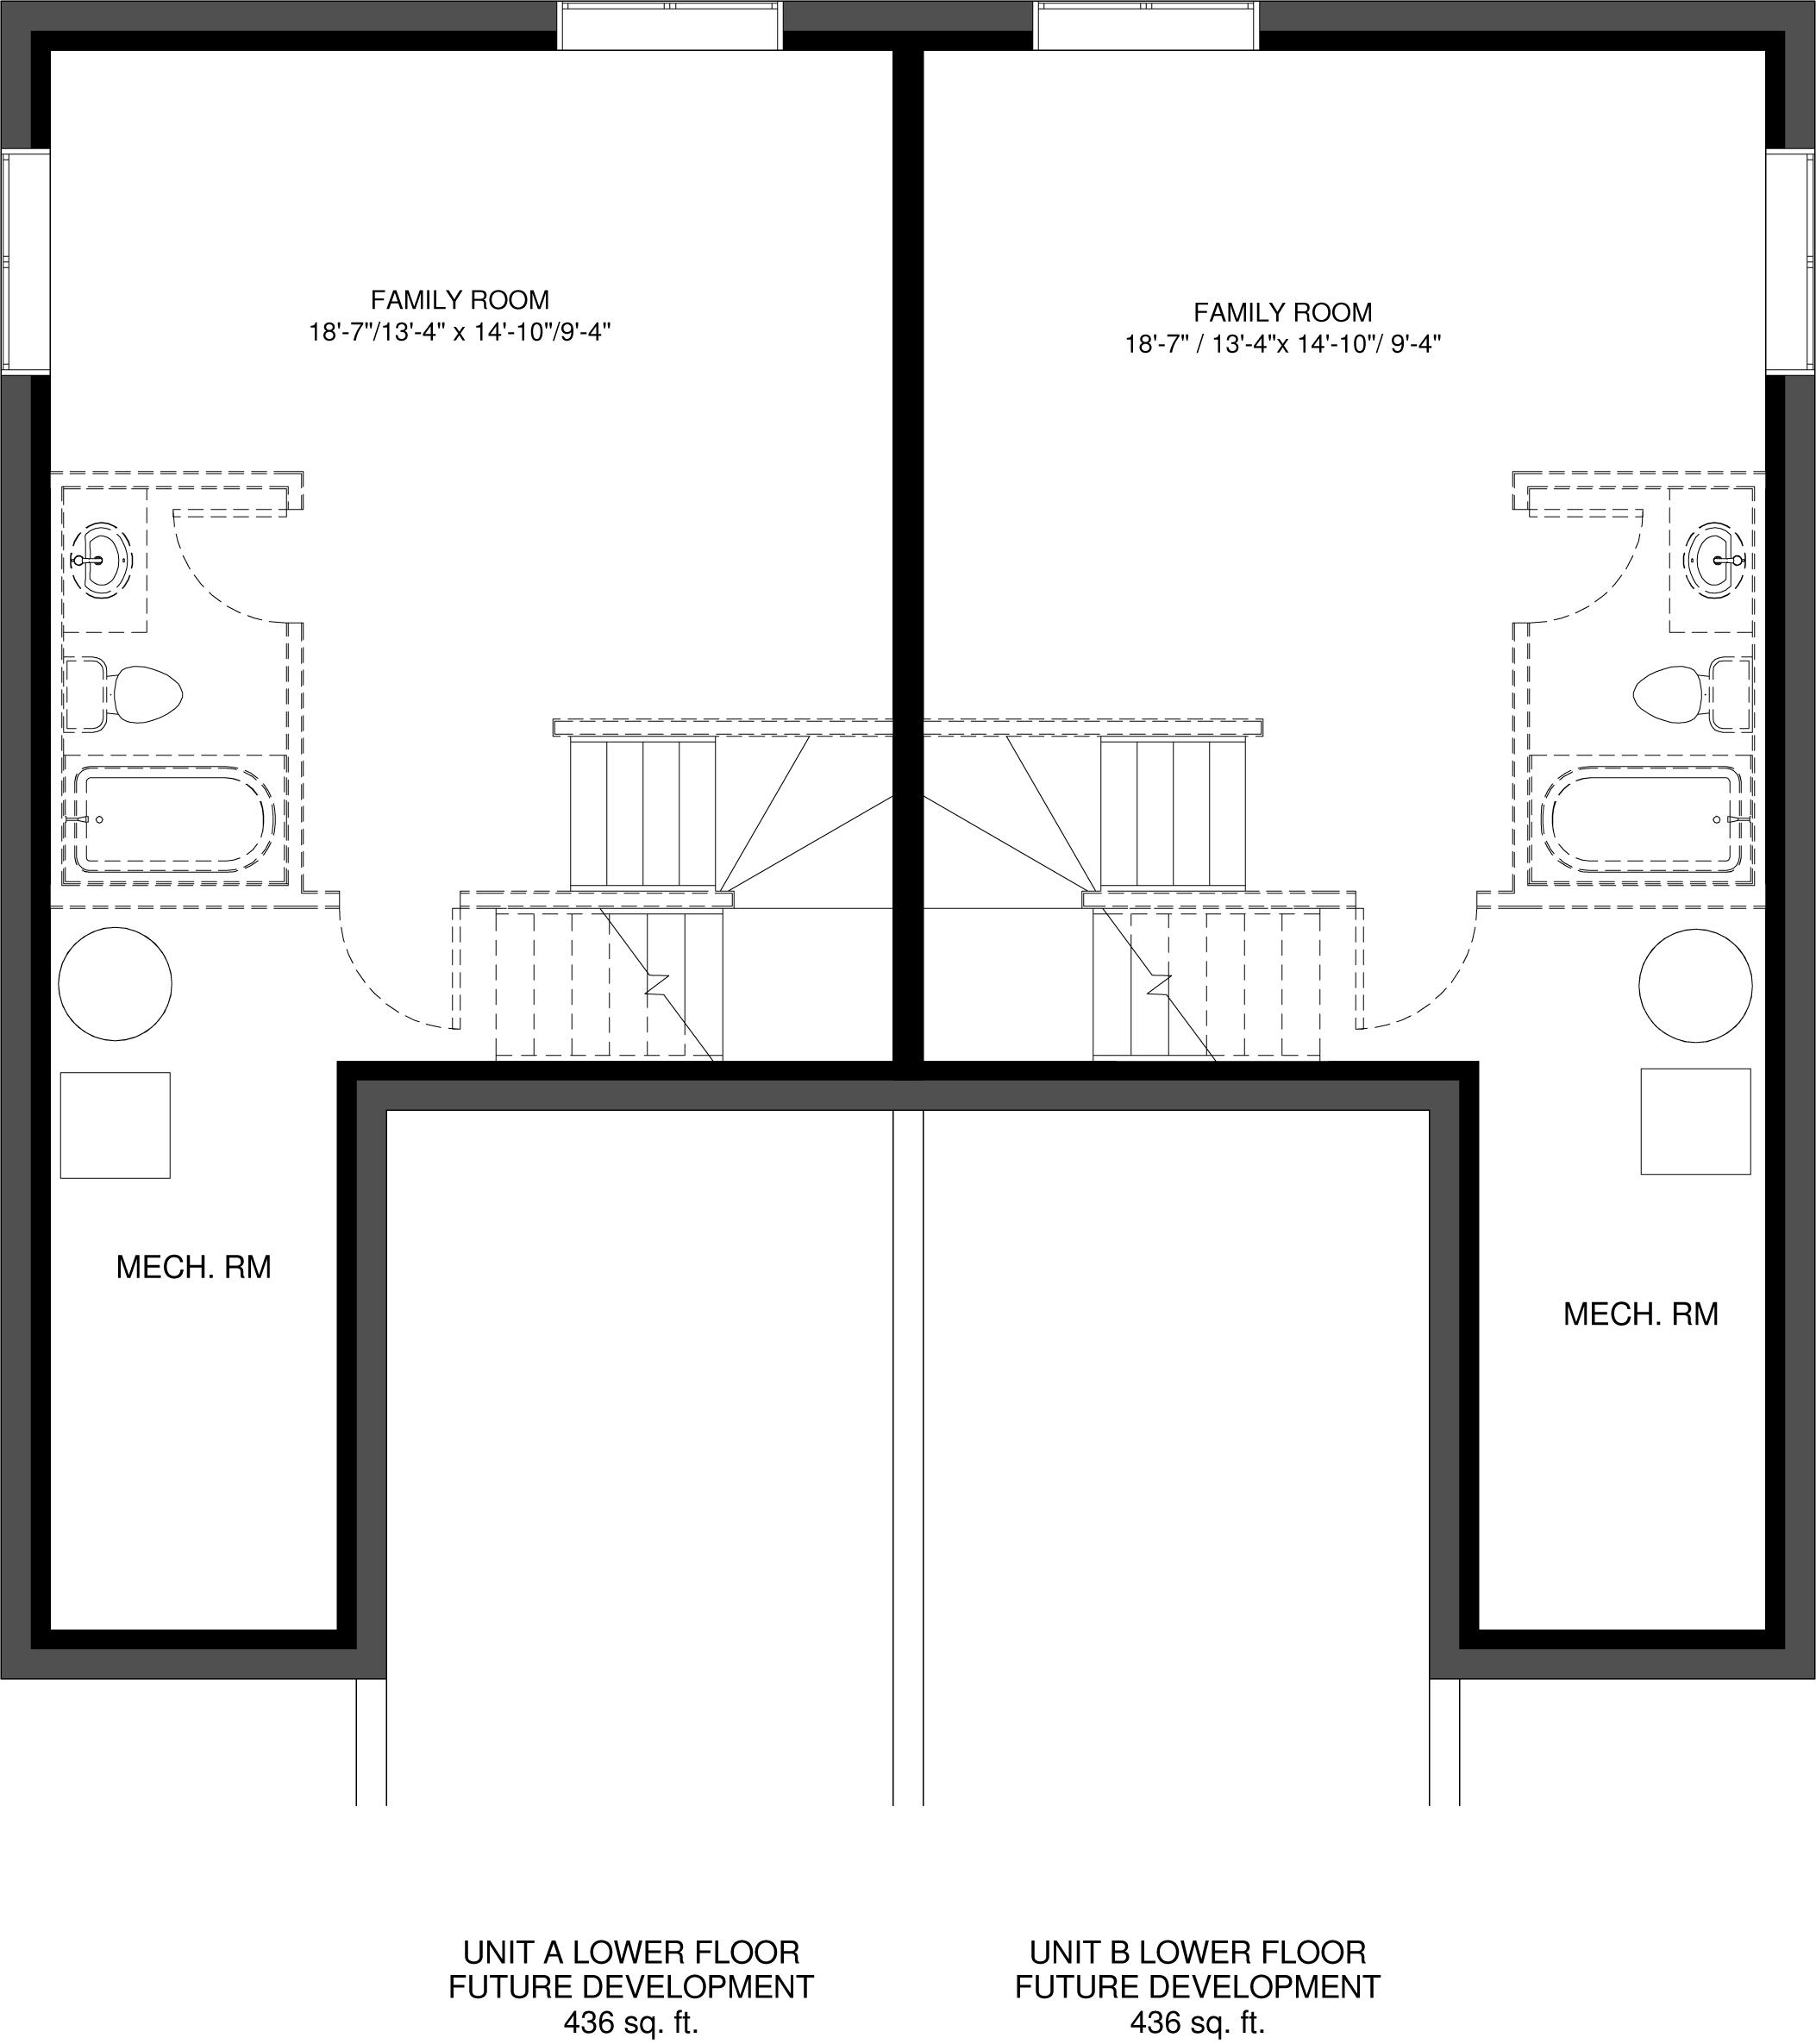 Lower Floor Future Development   Unit A 436 sq ft  Unit B 436 sq ft